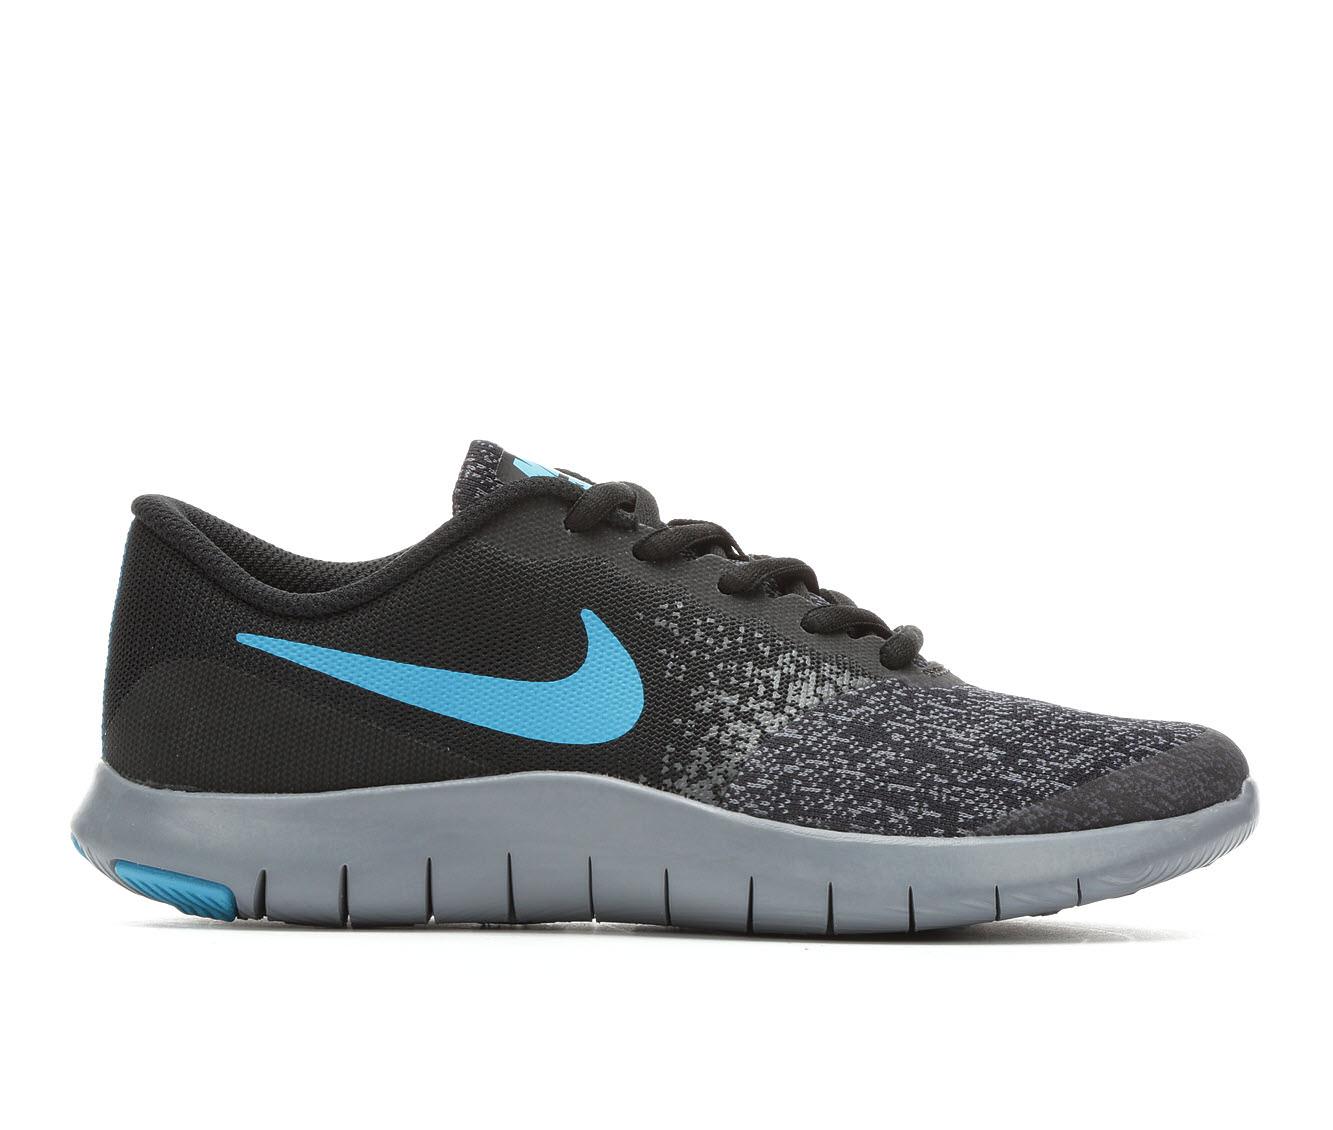 Boys' Nike Flex Contact Running Shoes (Black - Size 5.5 - Big Kid) 1737950